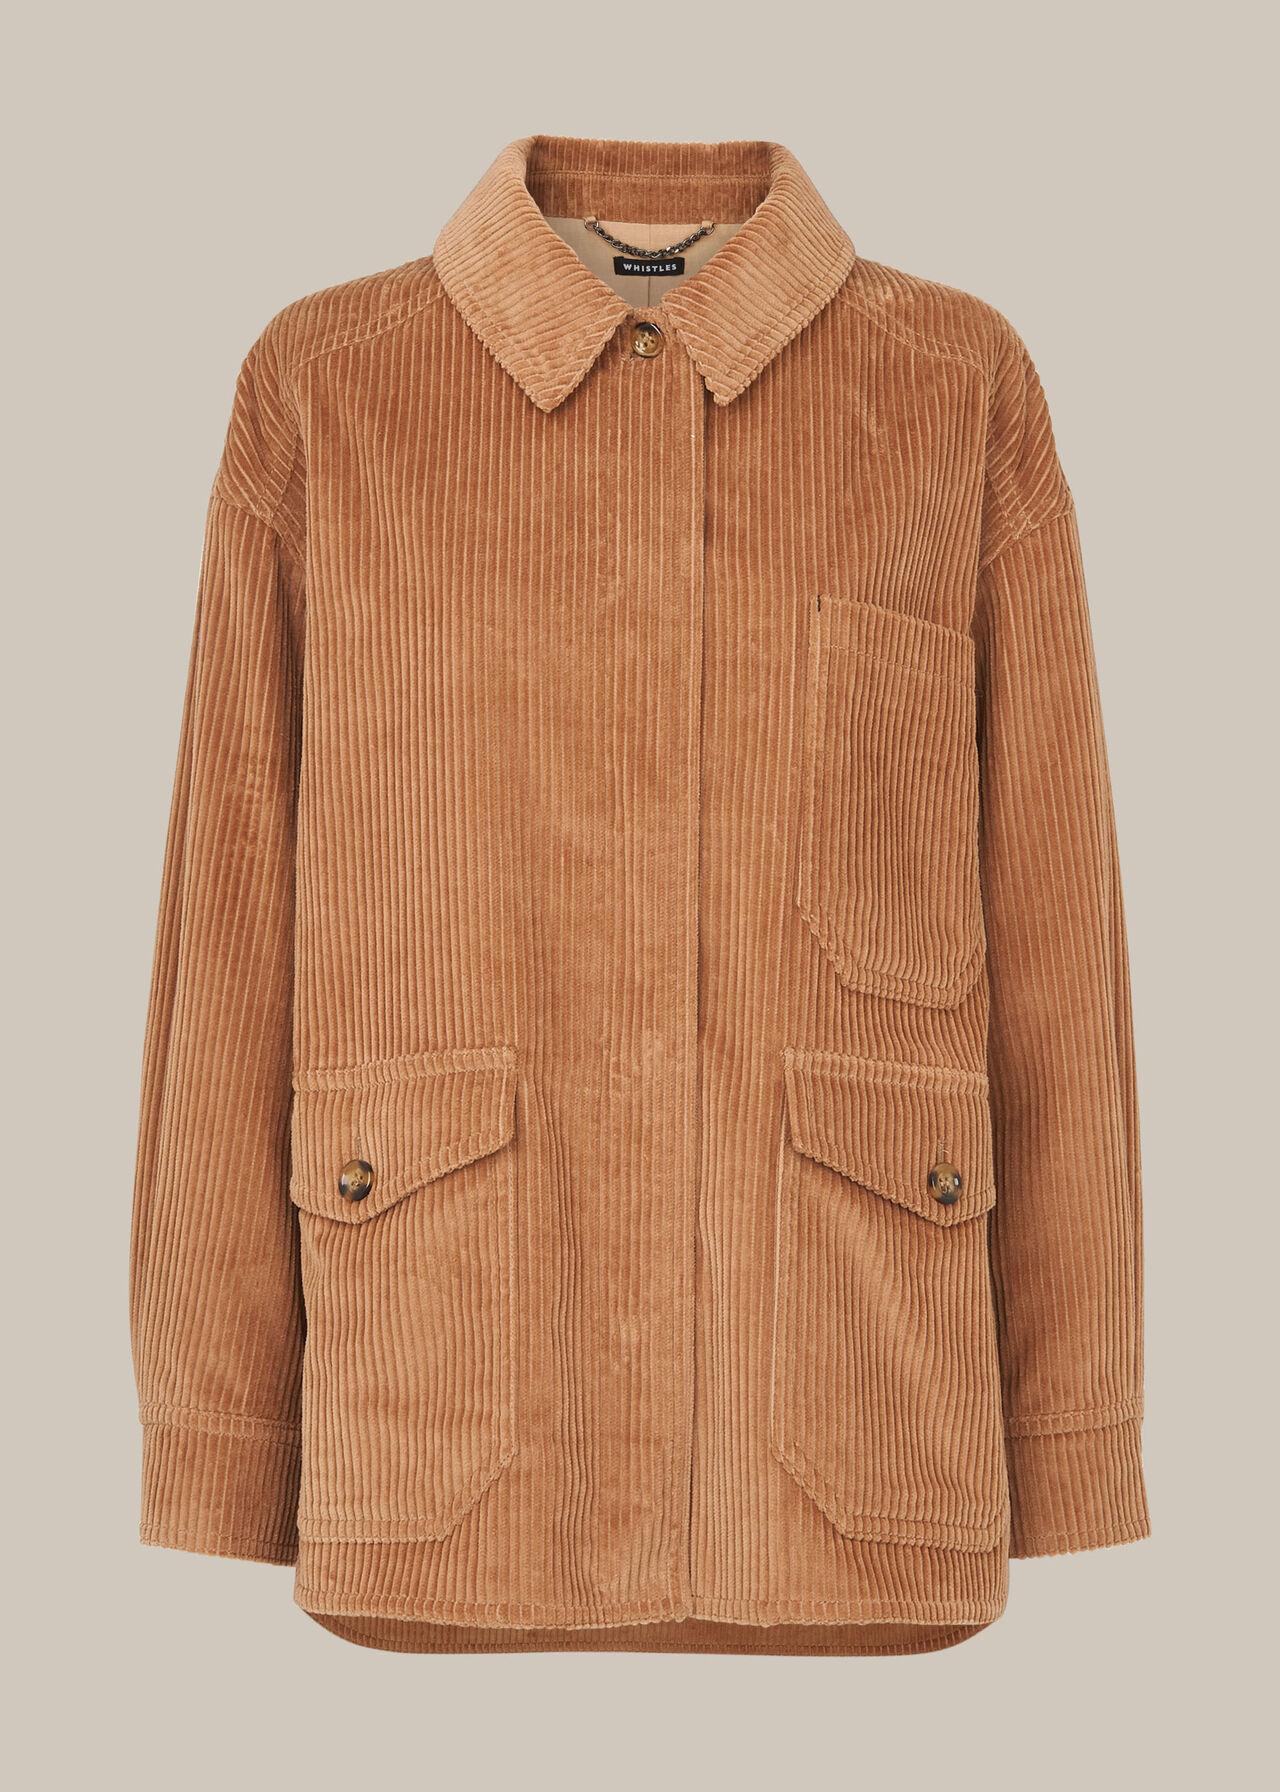 Corduroy Button Up Jacket